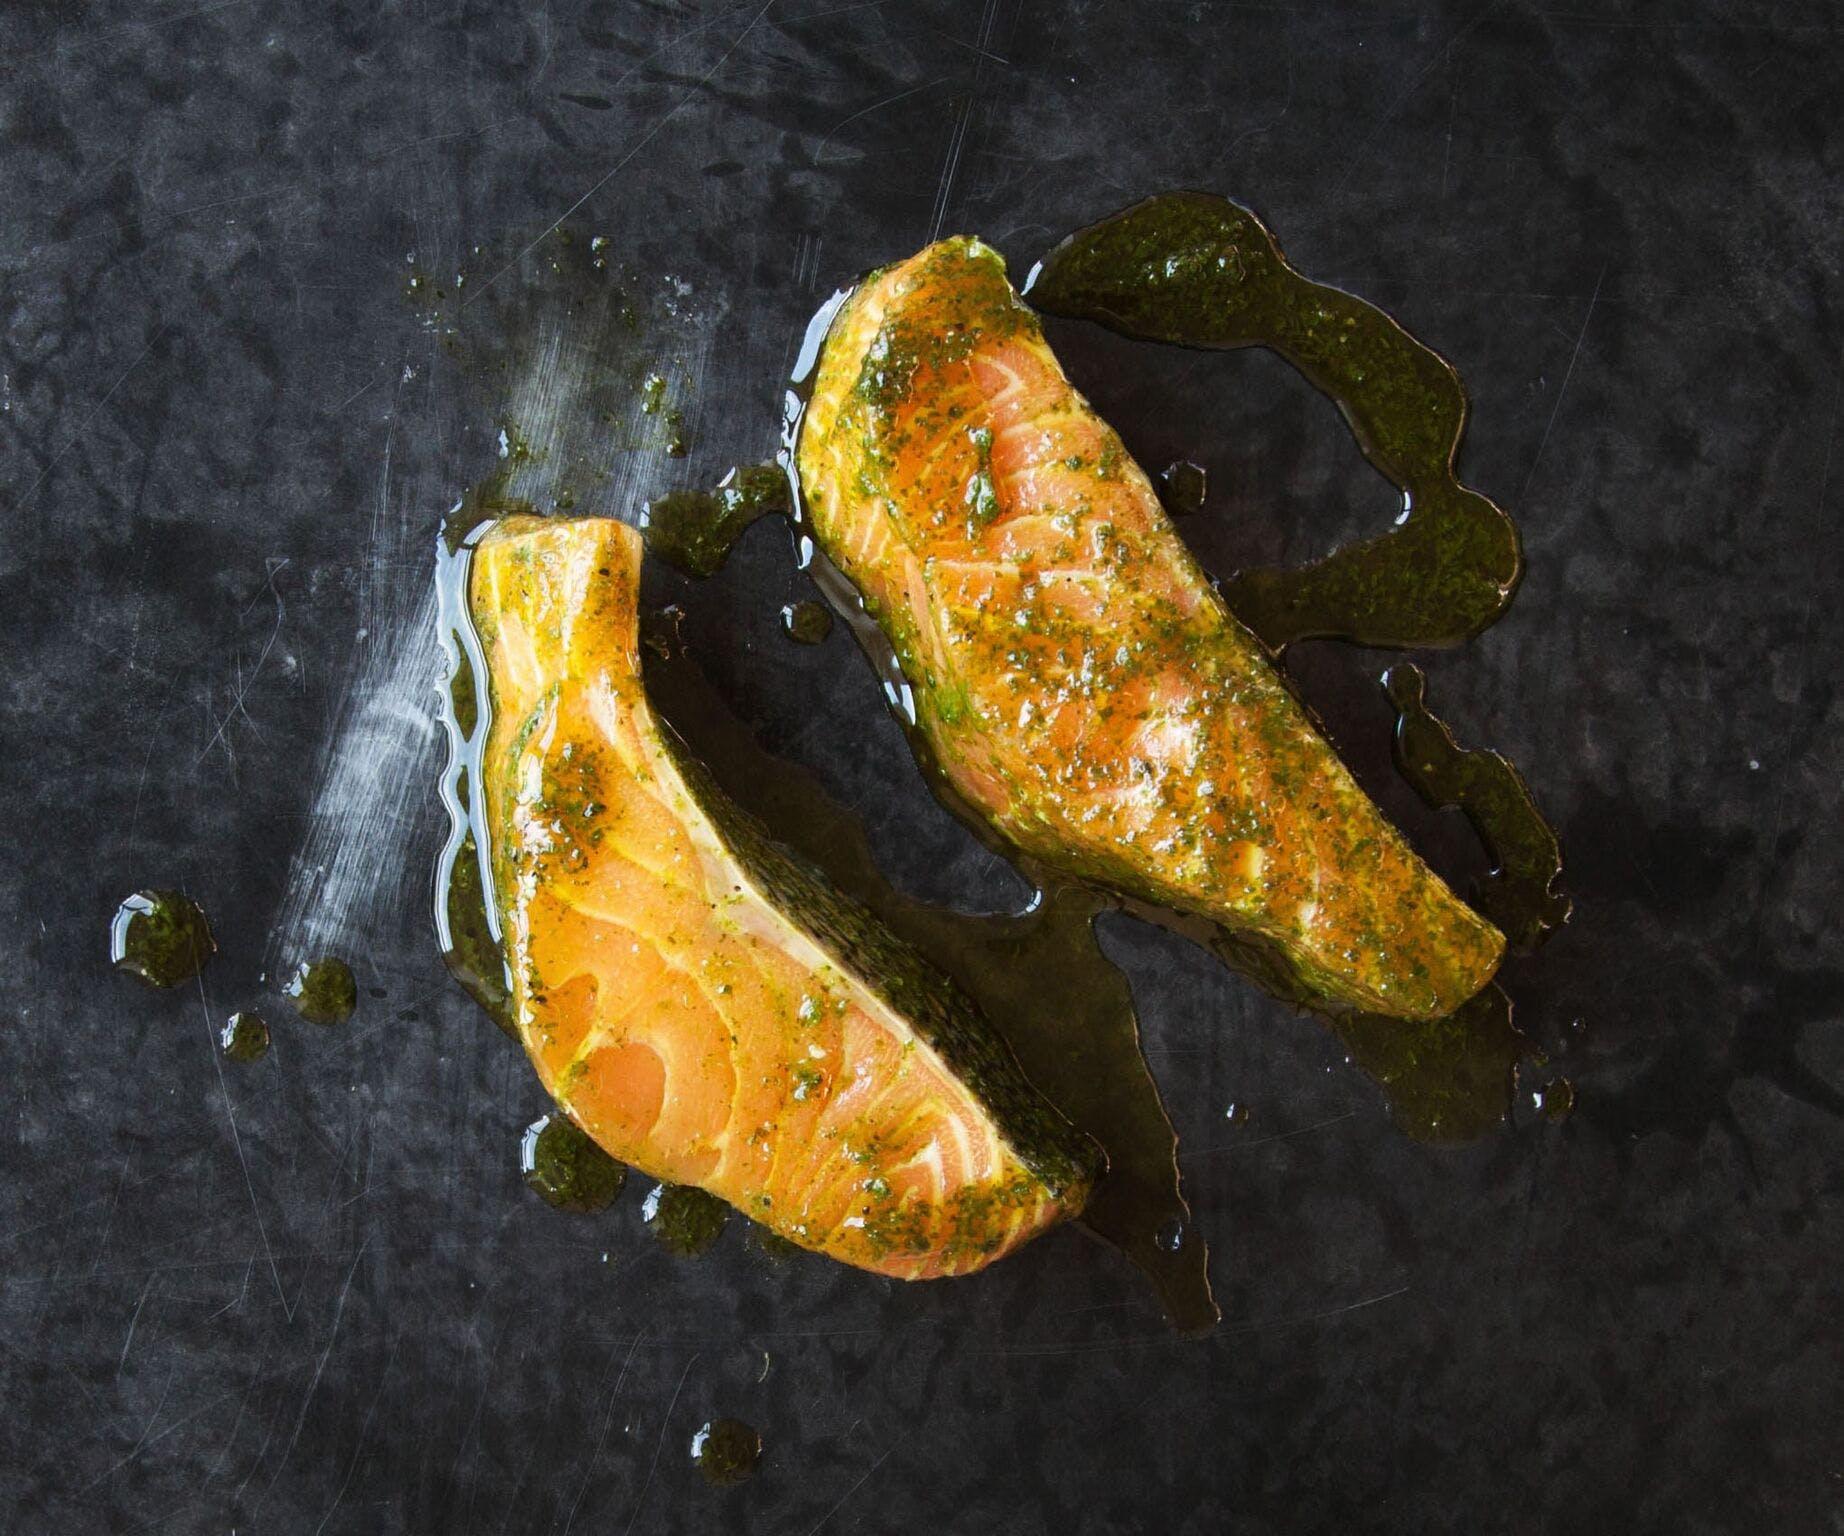 Marinated Salmon fillets in Coriander Oil